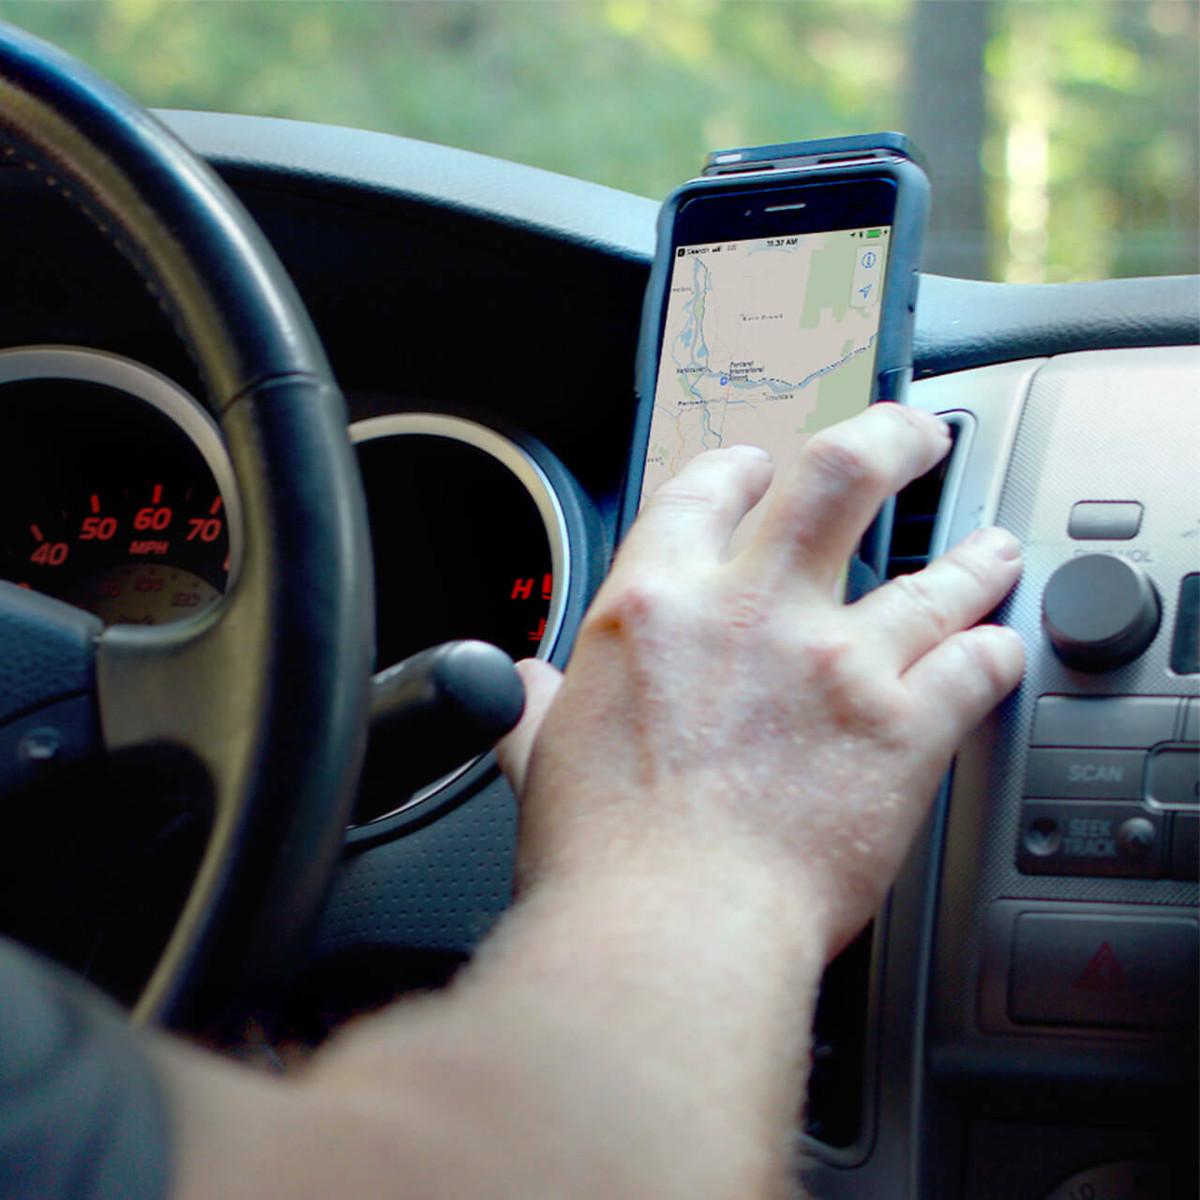 weBoost weBoost Drive Sleek 4G Cell Phone Signal Booster, Refurbished or 470135R